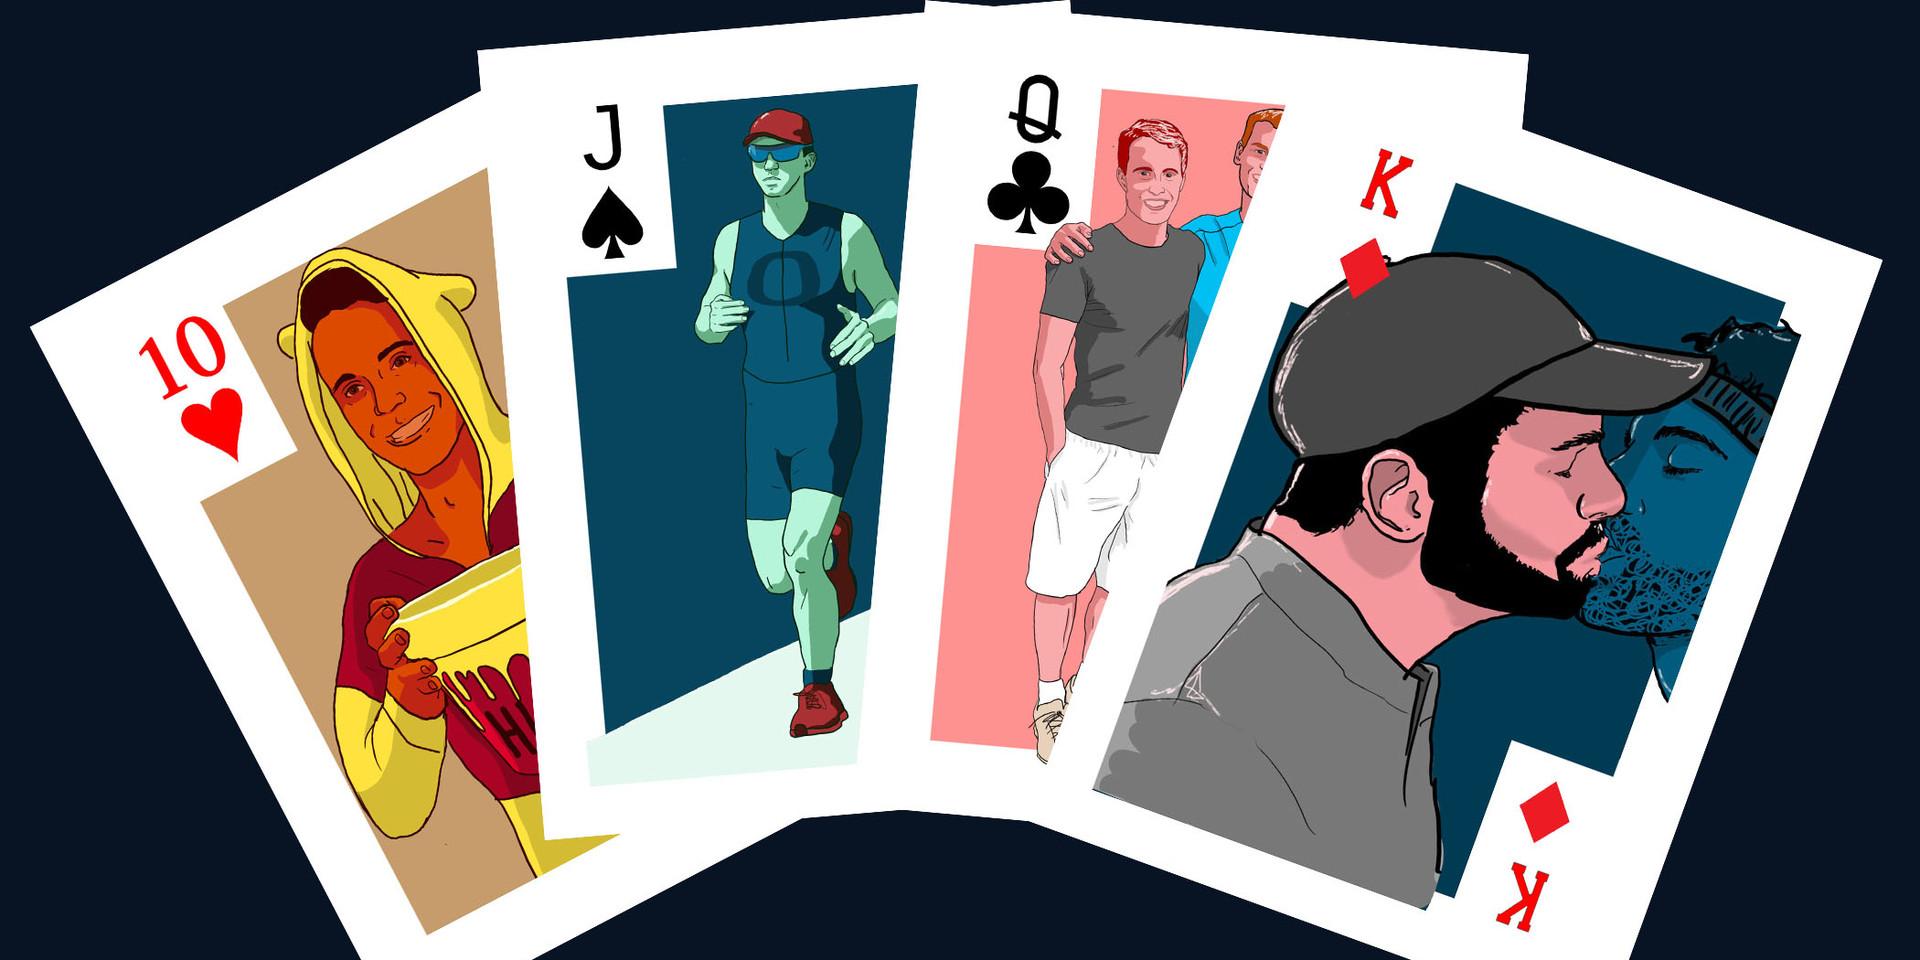 card spread.jpg